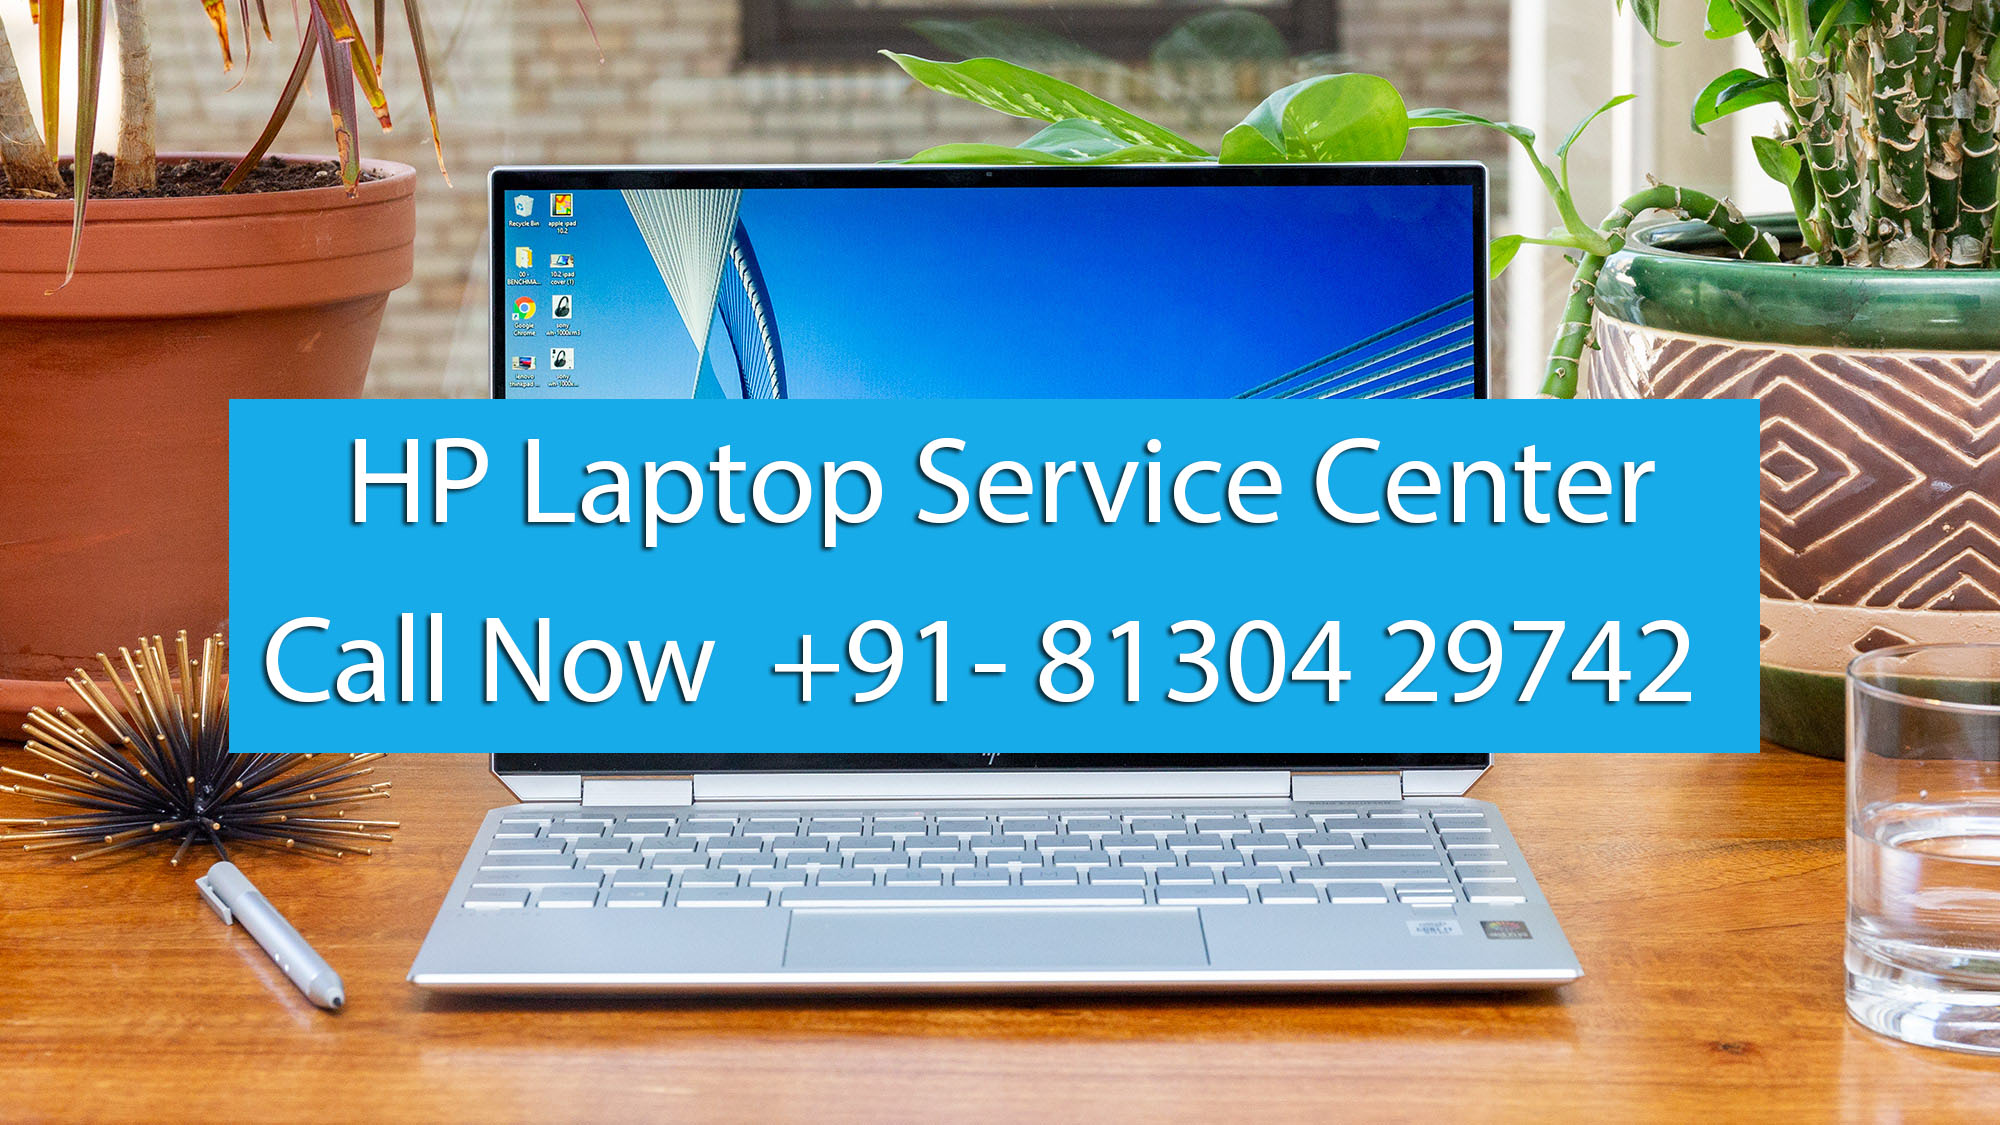 Hp service center in Gomti Nagar in Lucknow